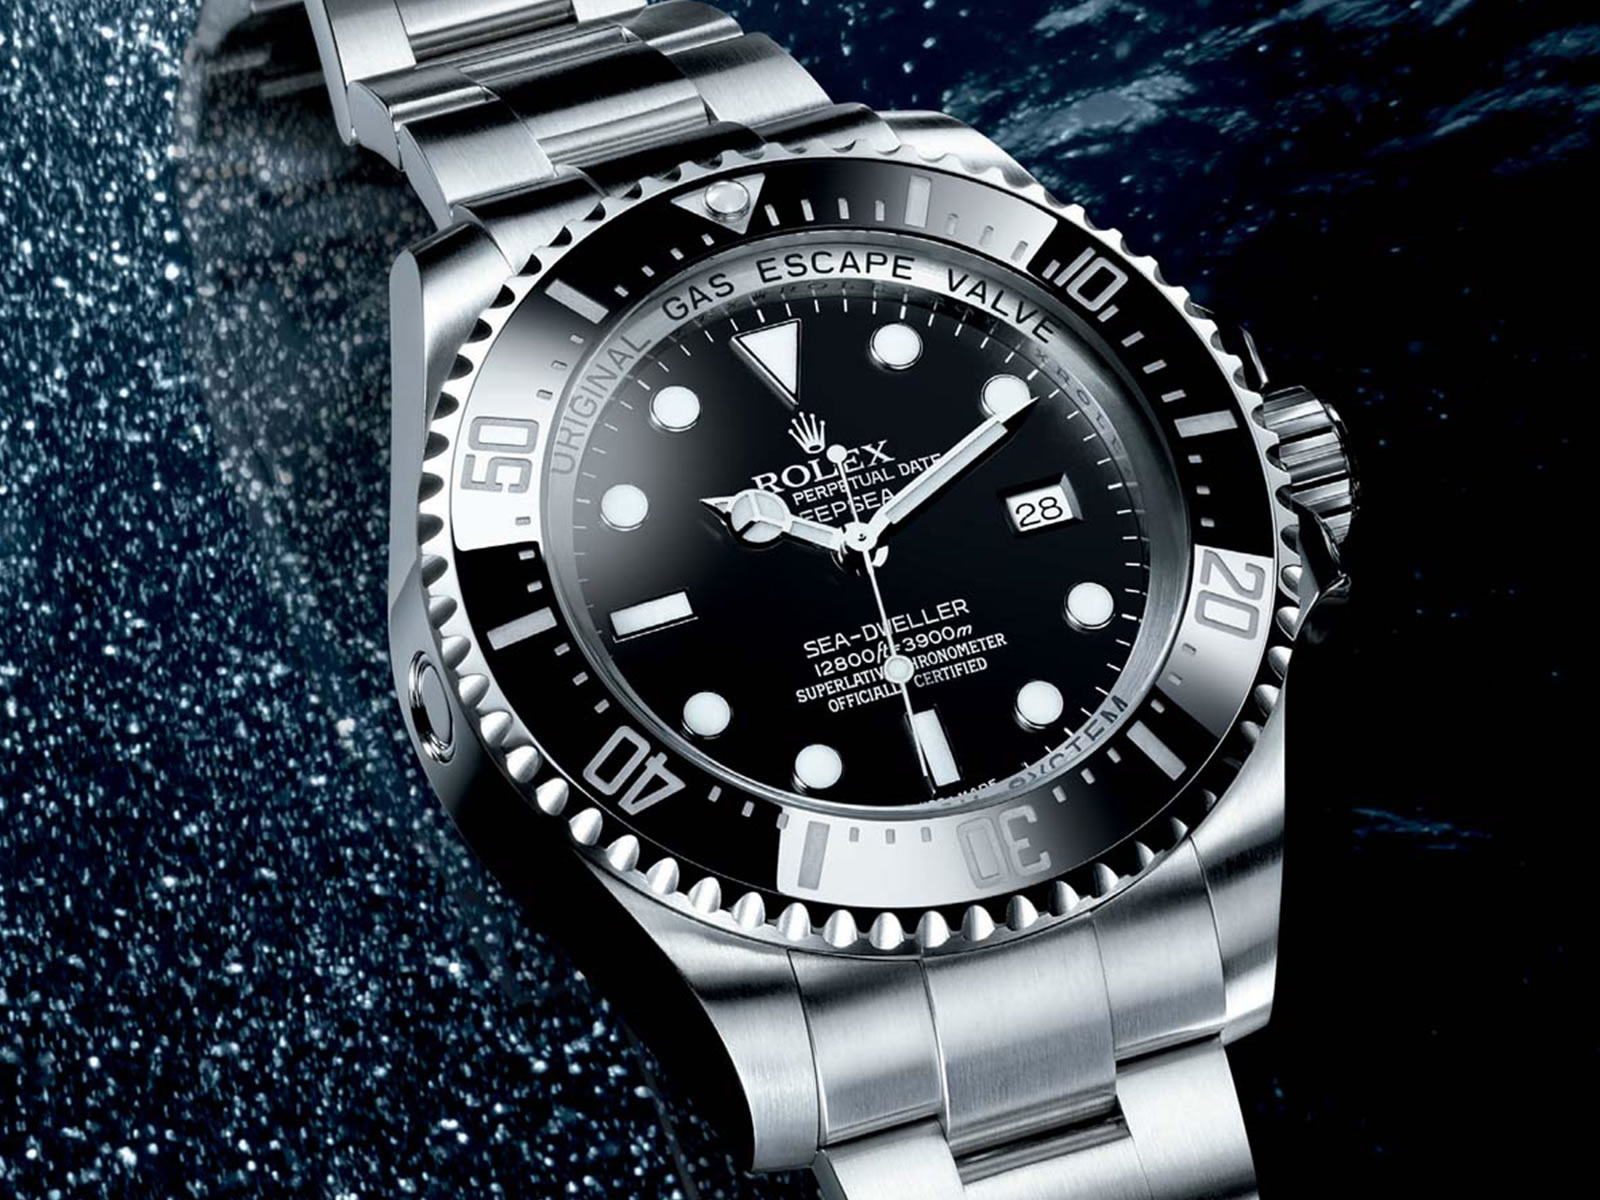 126660-rolex-sea-dweller-deepsea-.jpg